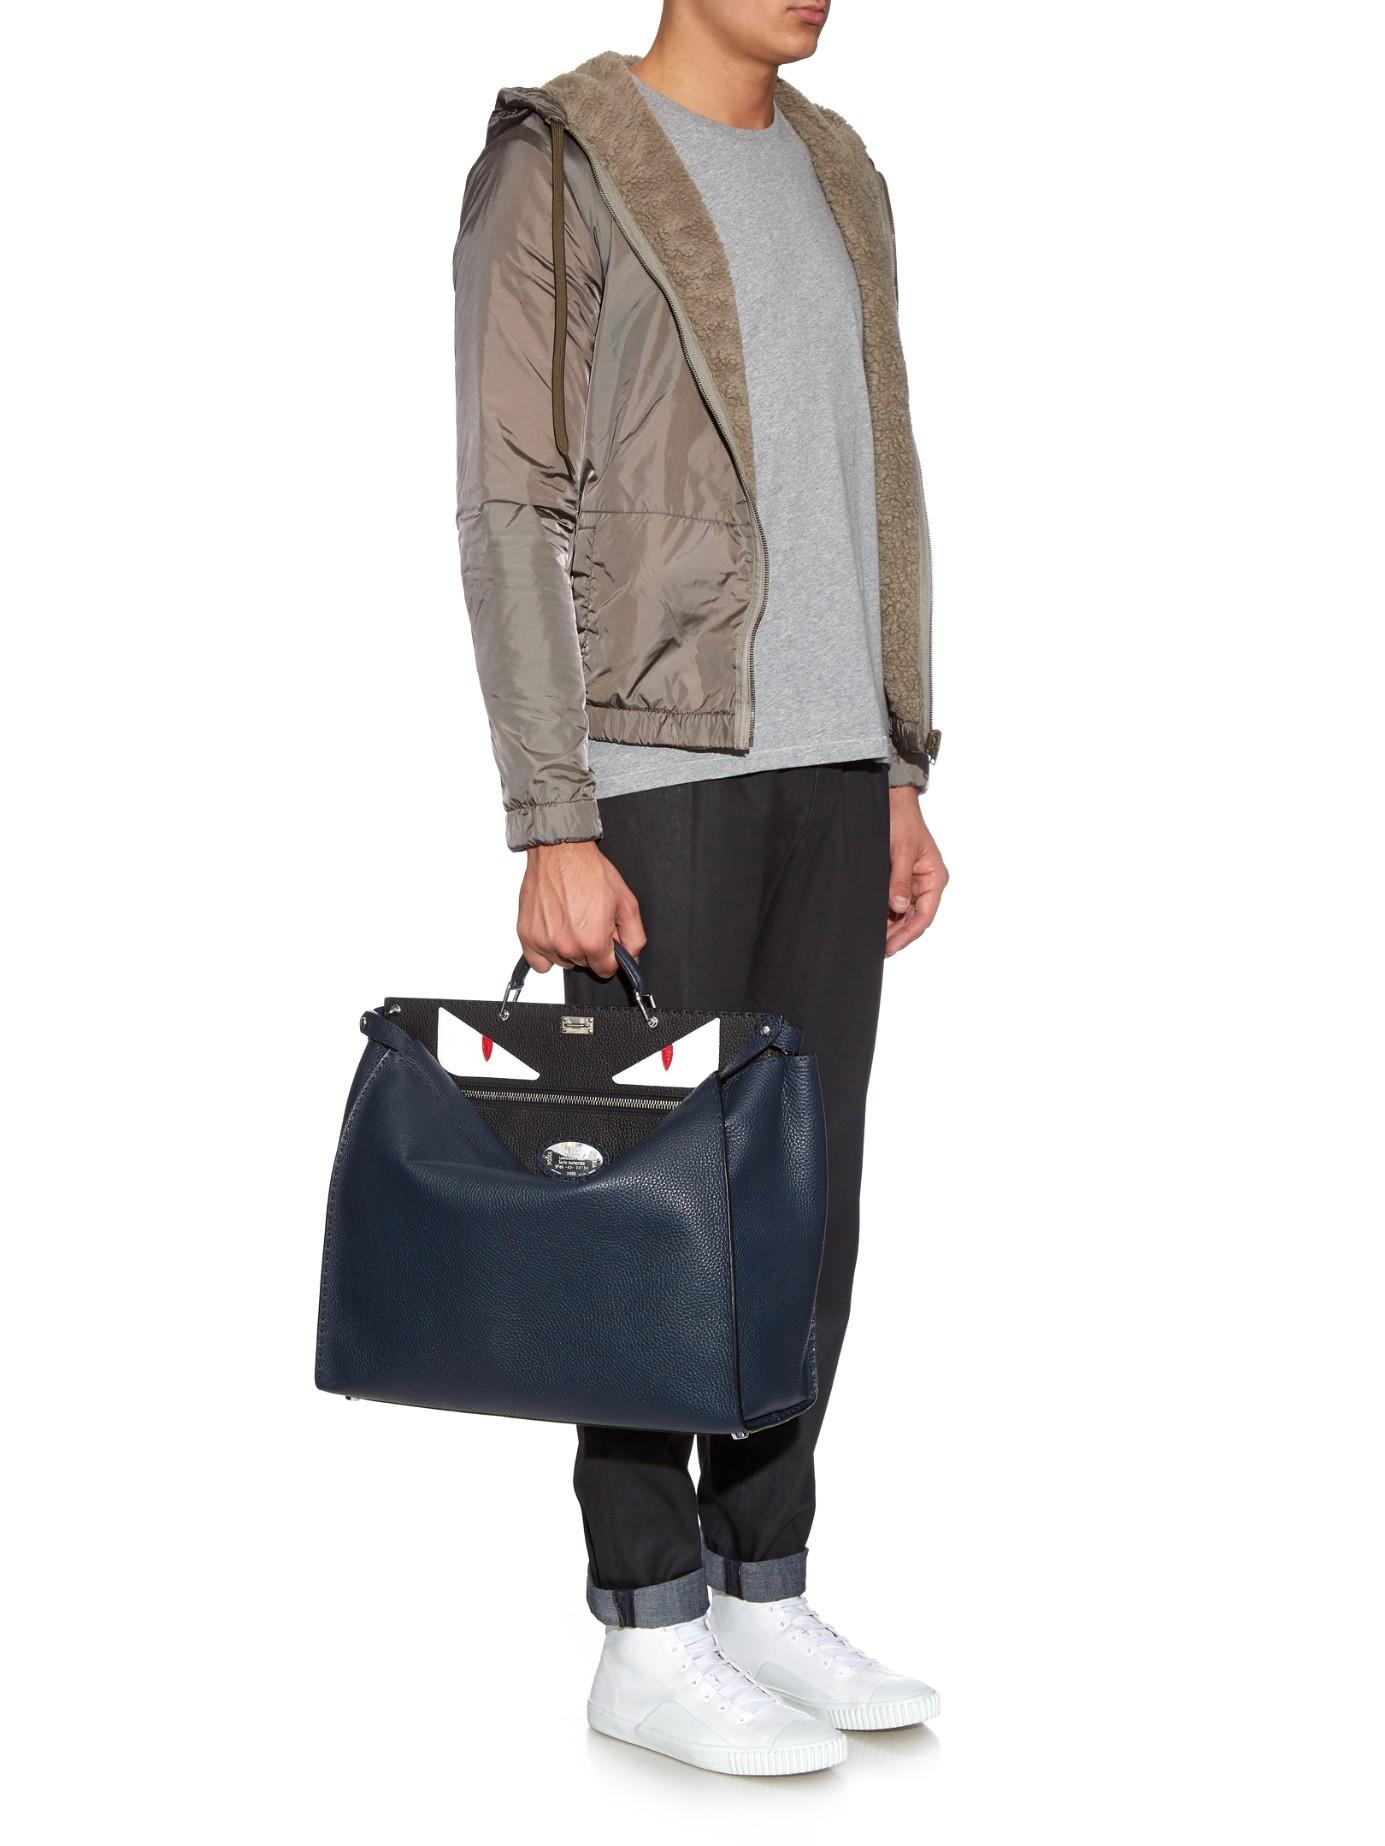 d29f9d67ddc Fendi Selleria Peekaboo Leather Tote in Blue for Men - Lyst